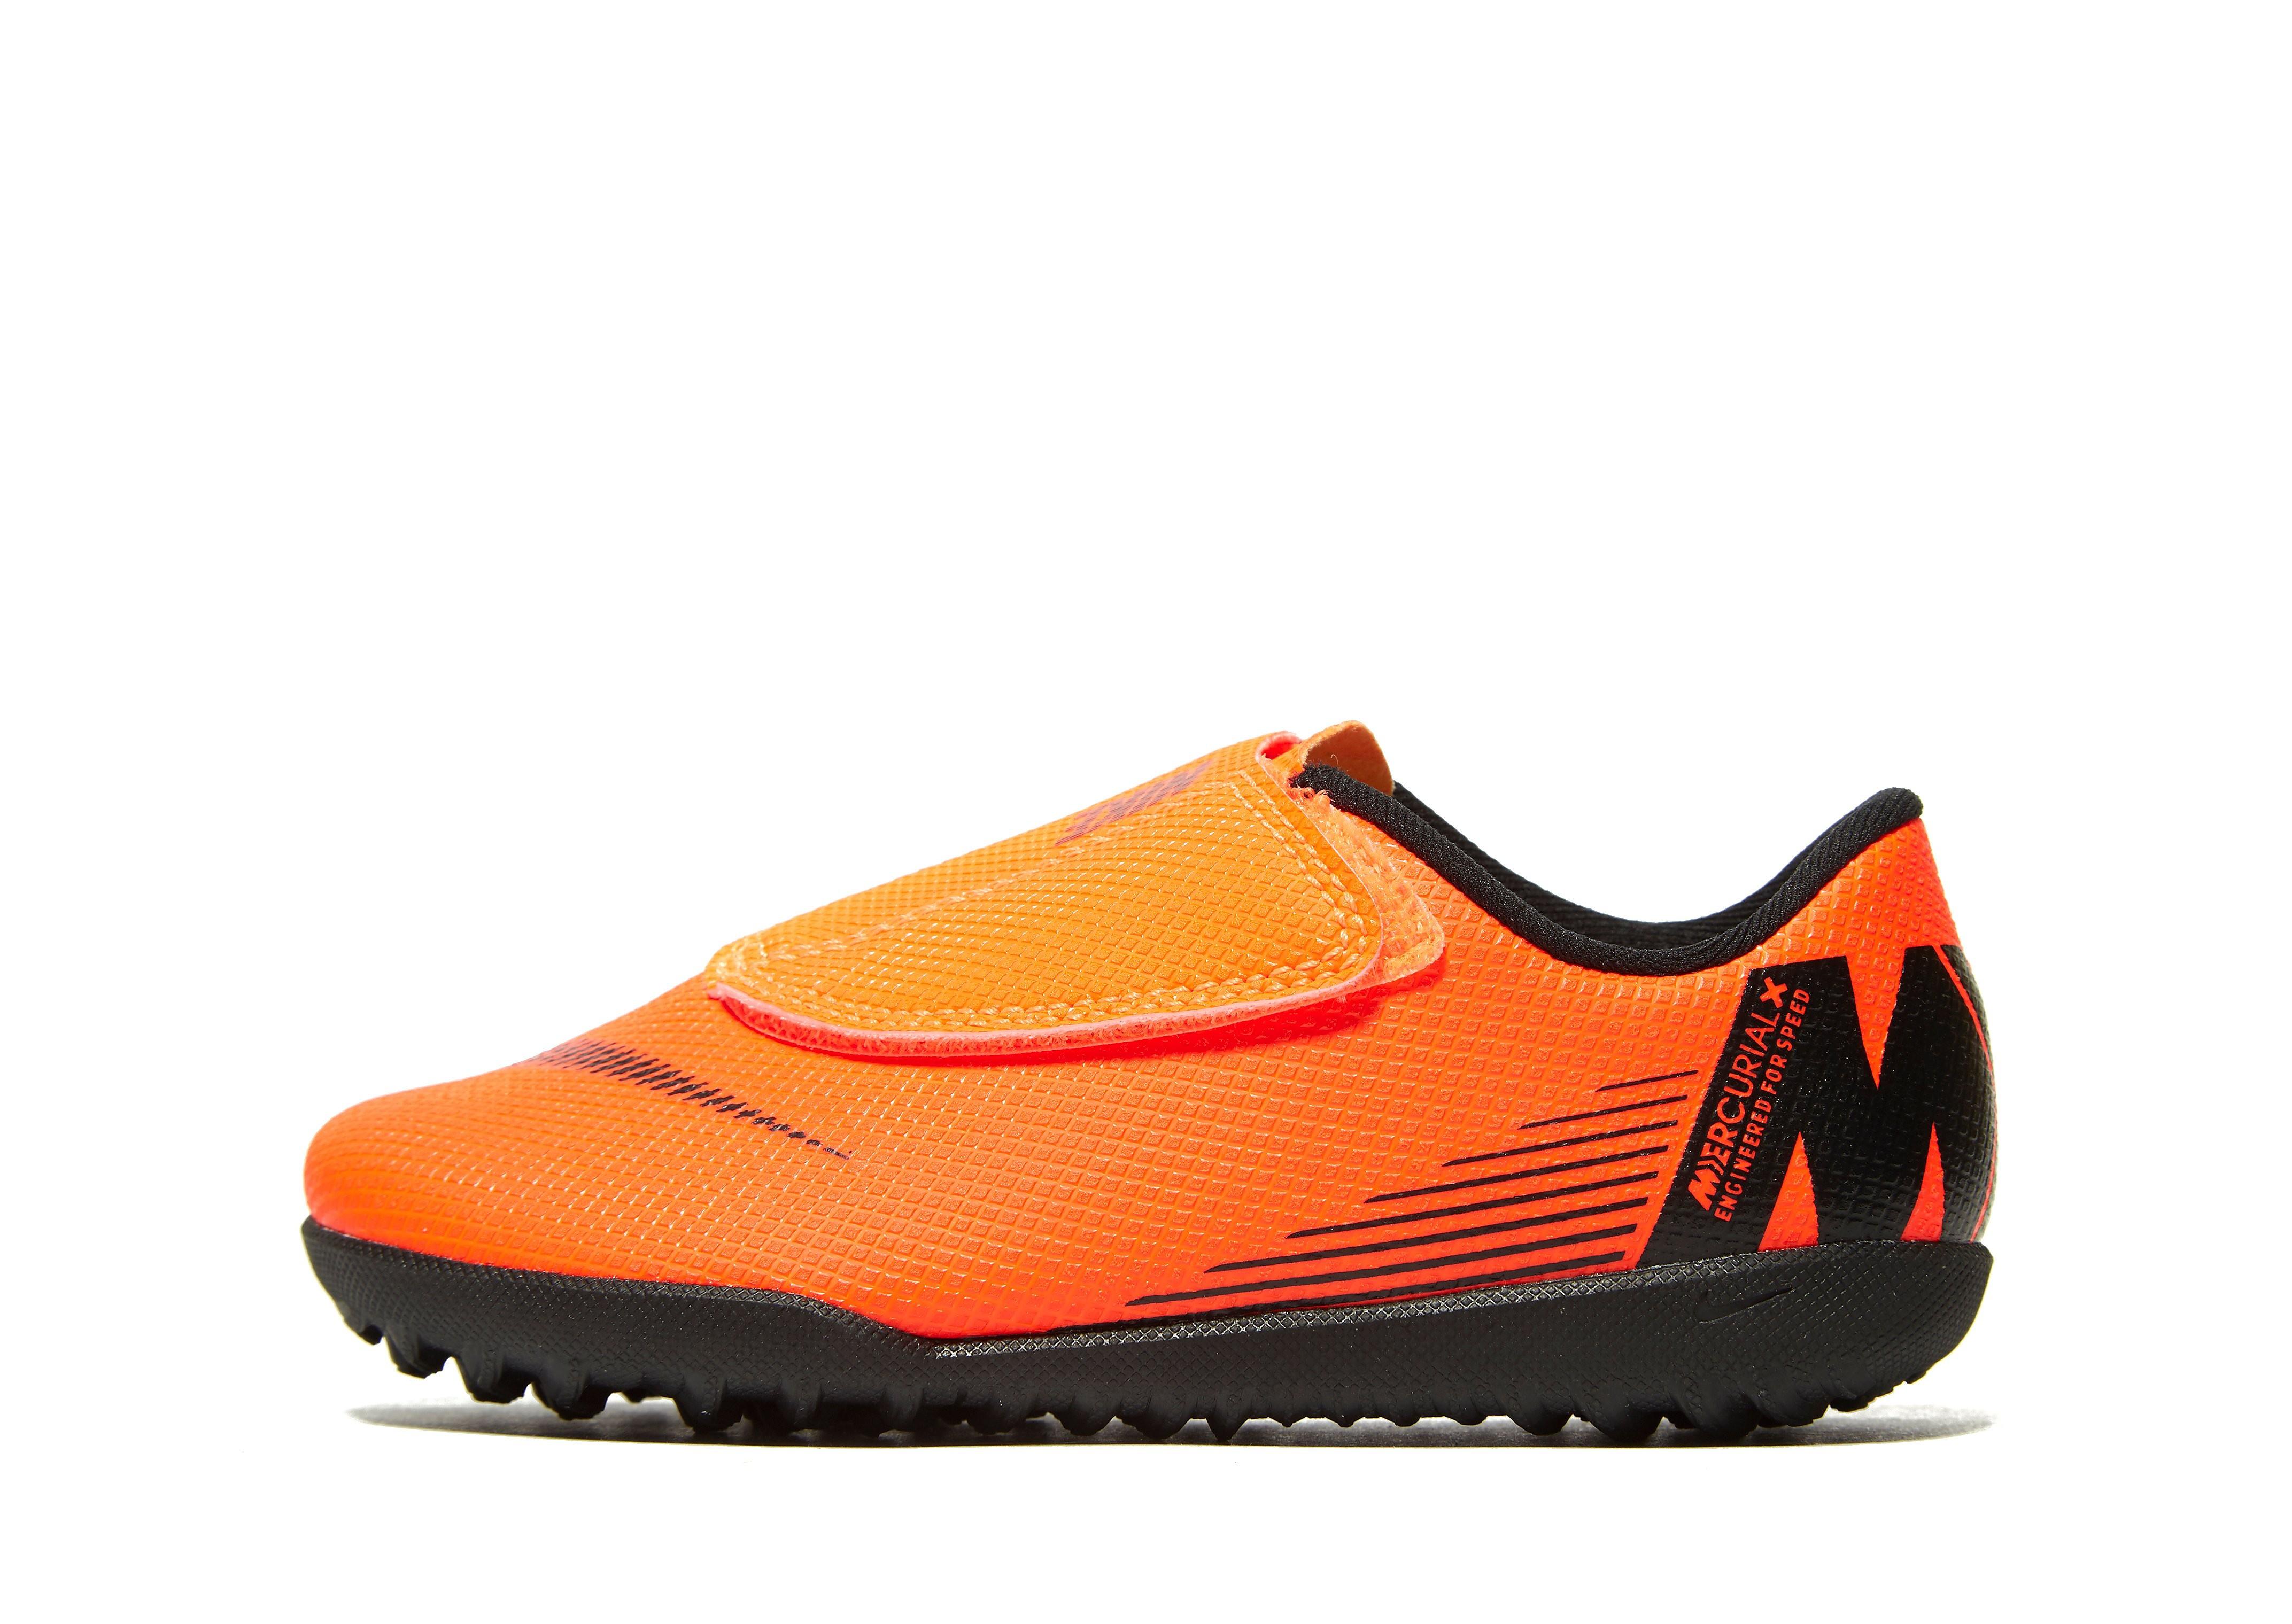 Nike Mercurial 360 Vapor Club TF Children